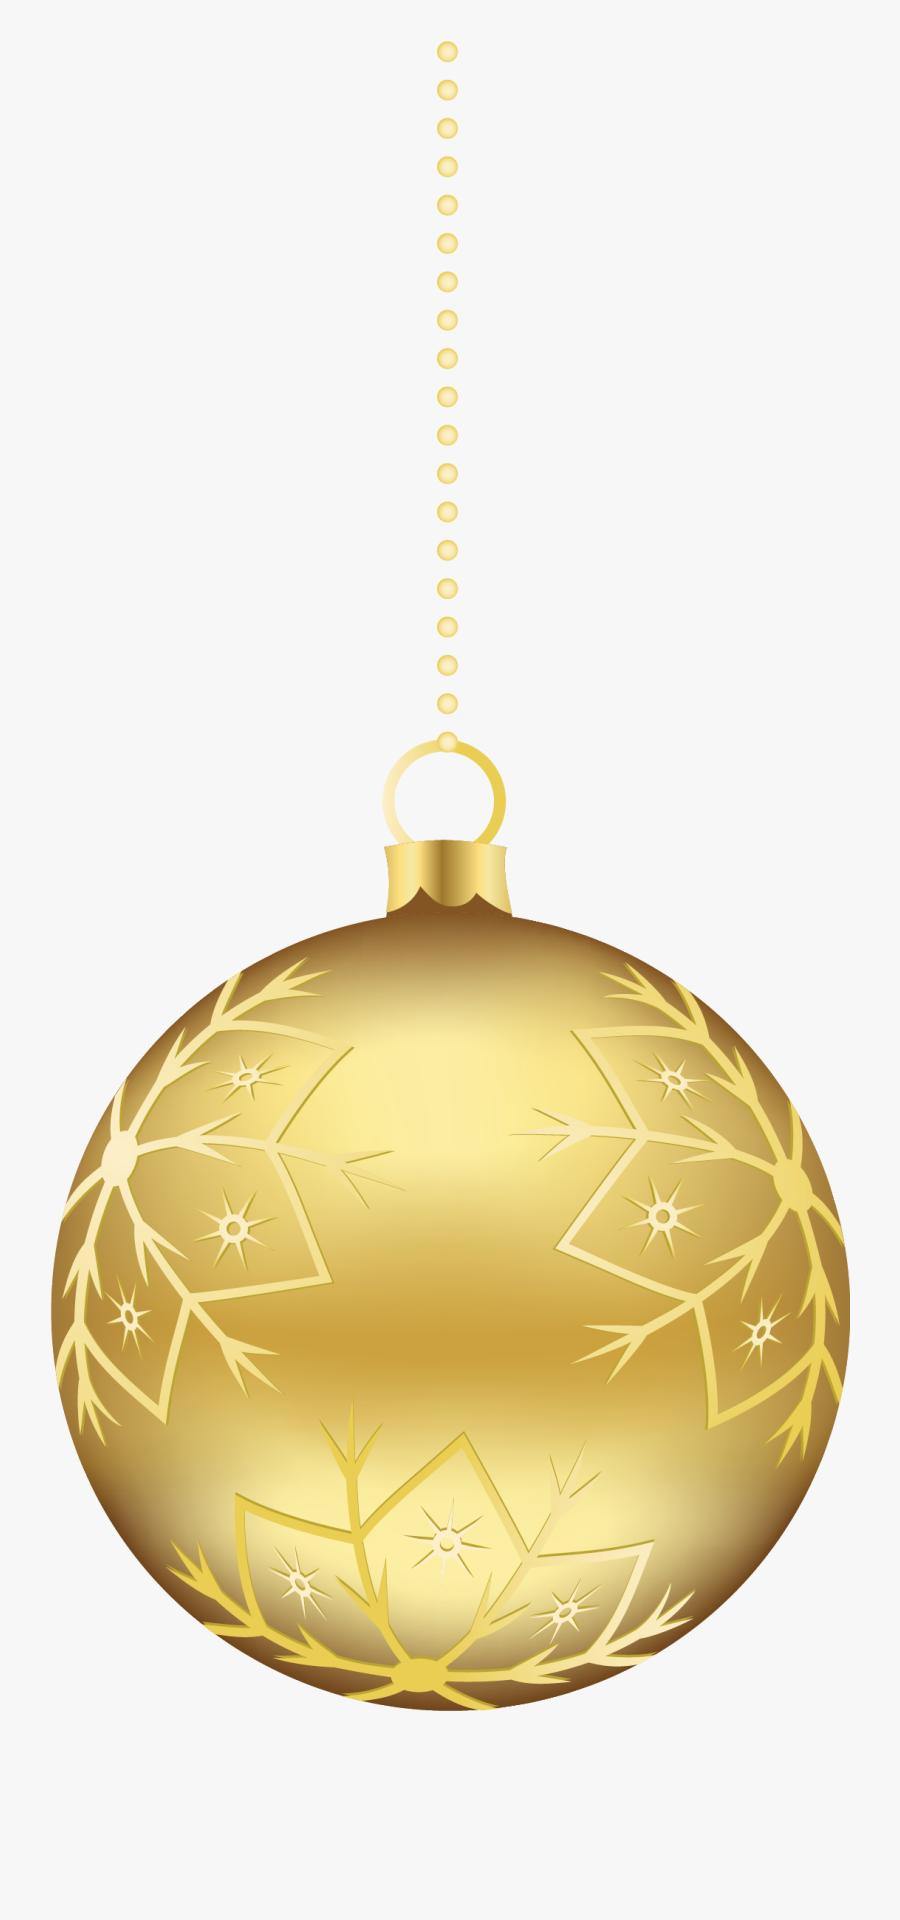 Large Transparent Gold Christmas Ball Ornament Png - Gold Christmas Balls Clipart, Transparent Clipart